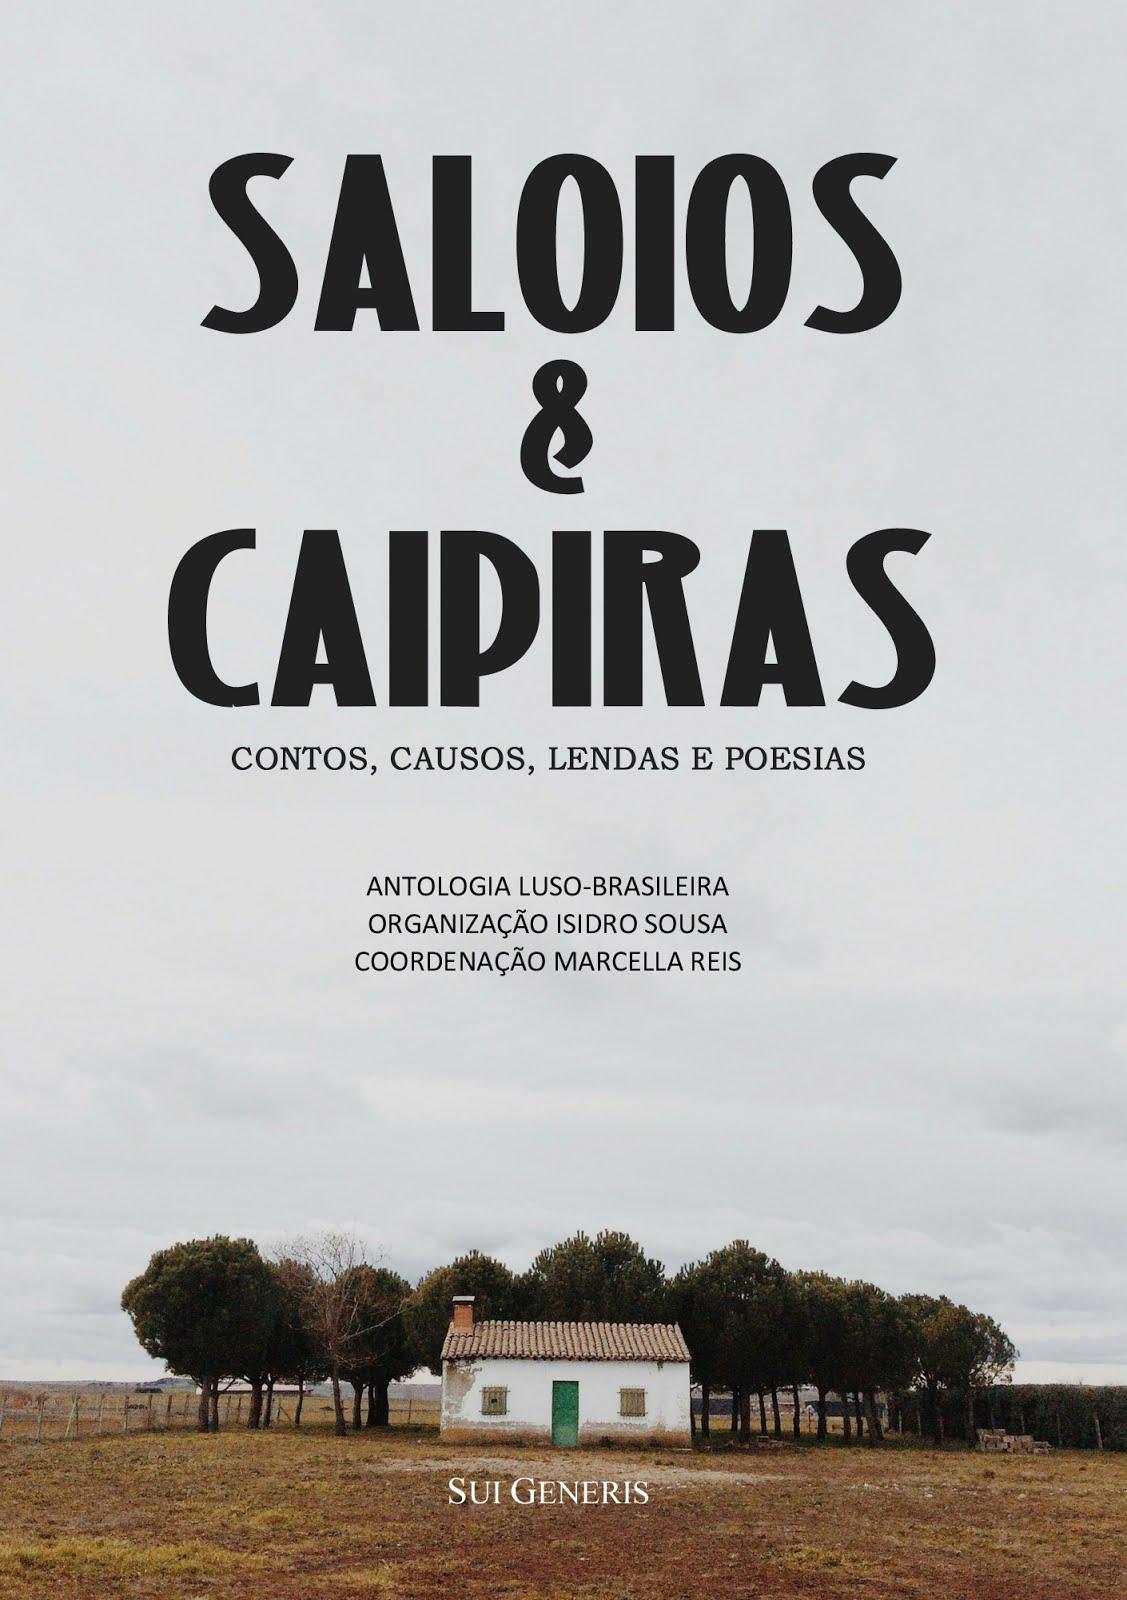 Organizei e Editei a antologia «SALOIOS & CAIPIRAS», que inclui o meu conto «O SEGREDO DE LEONARDO»